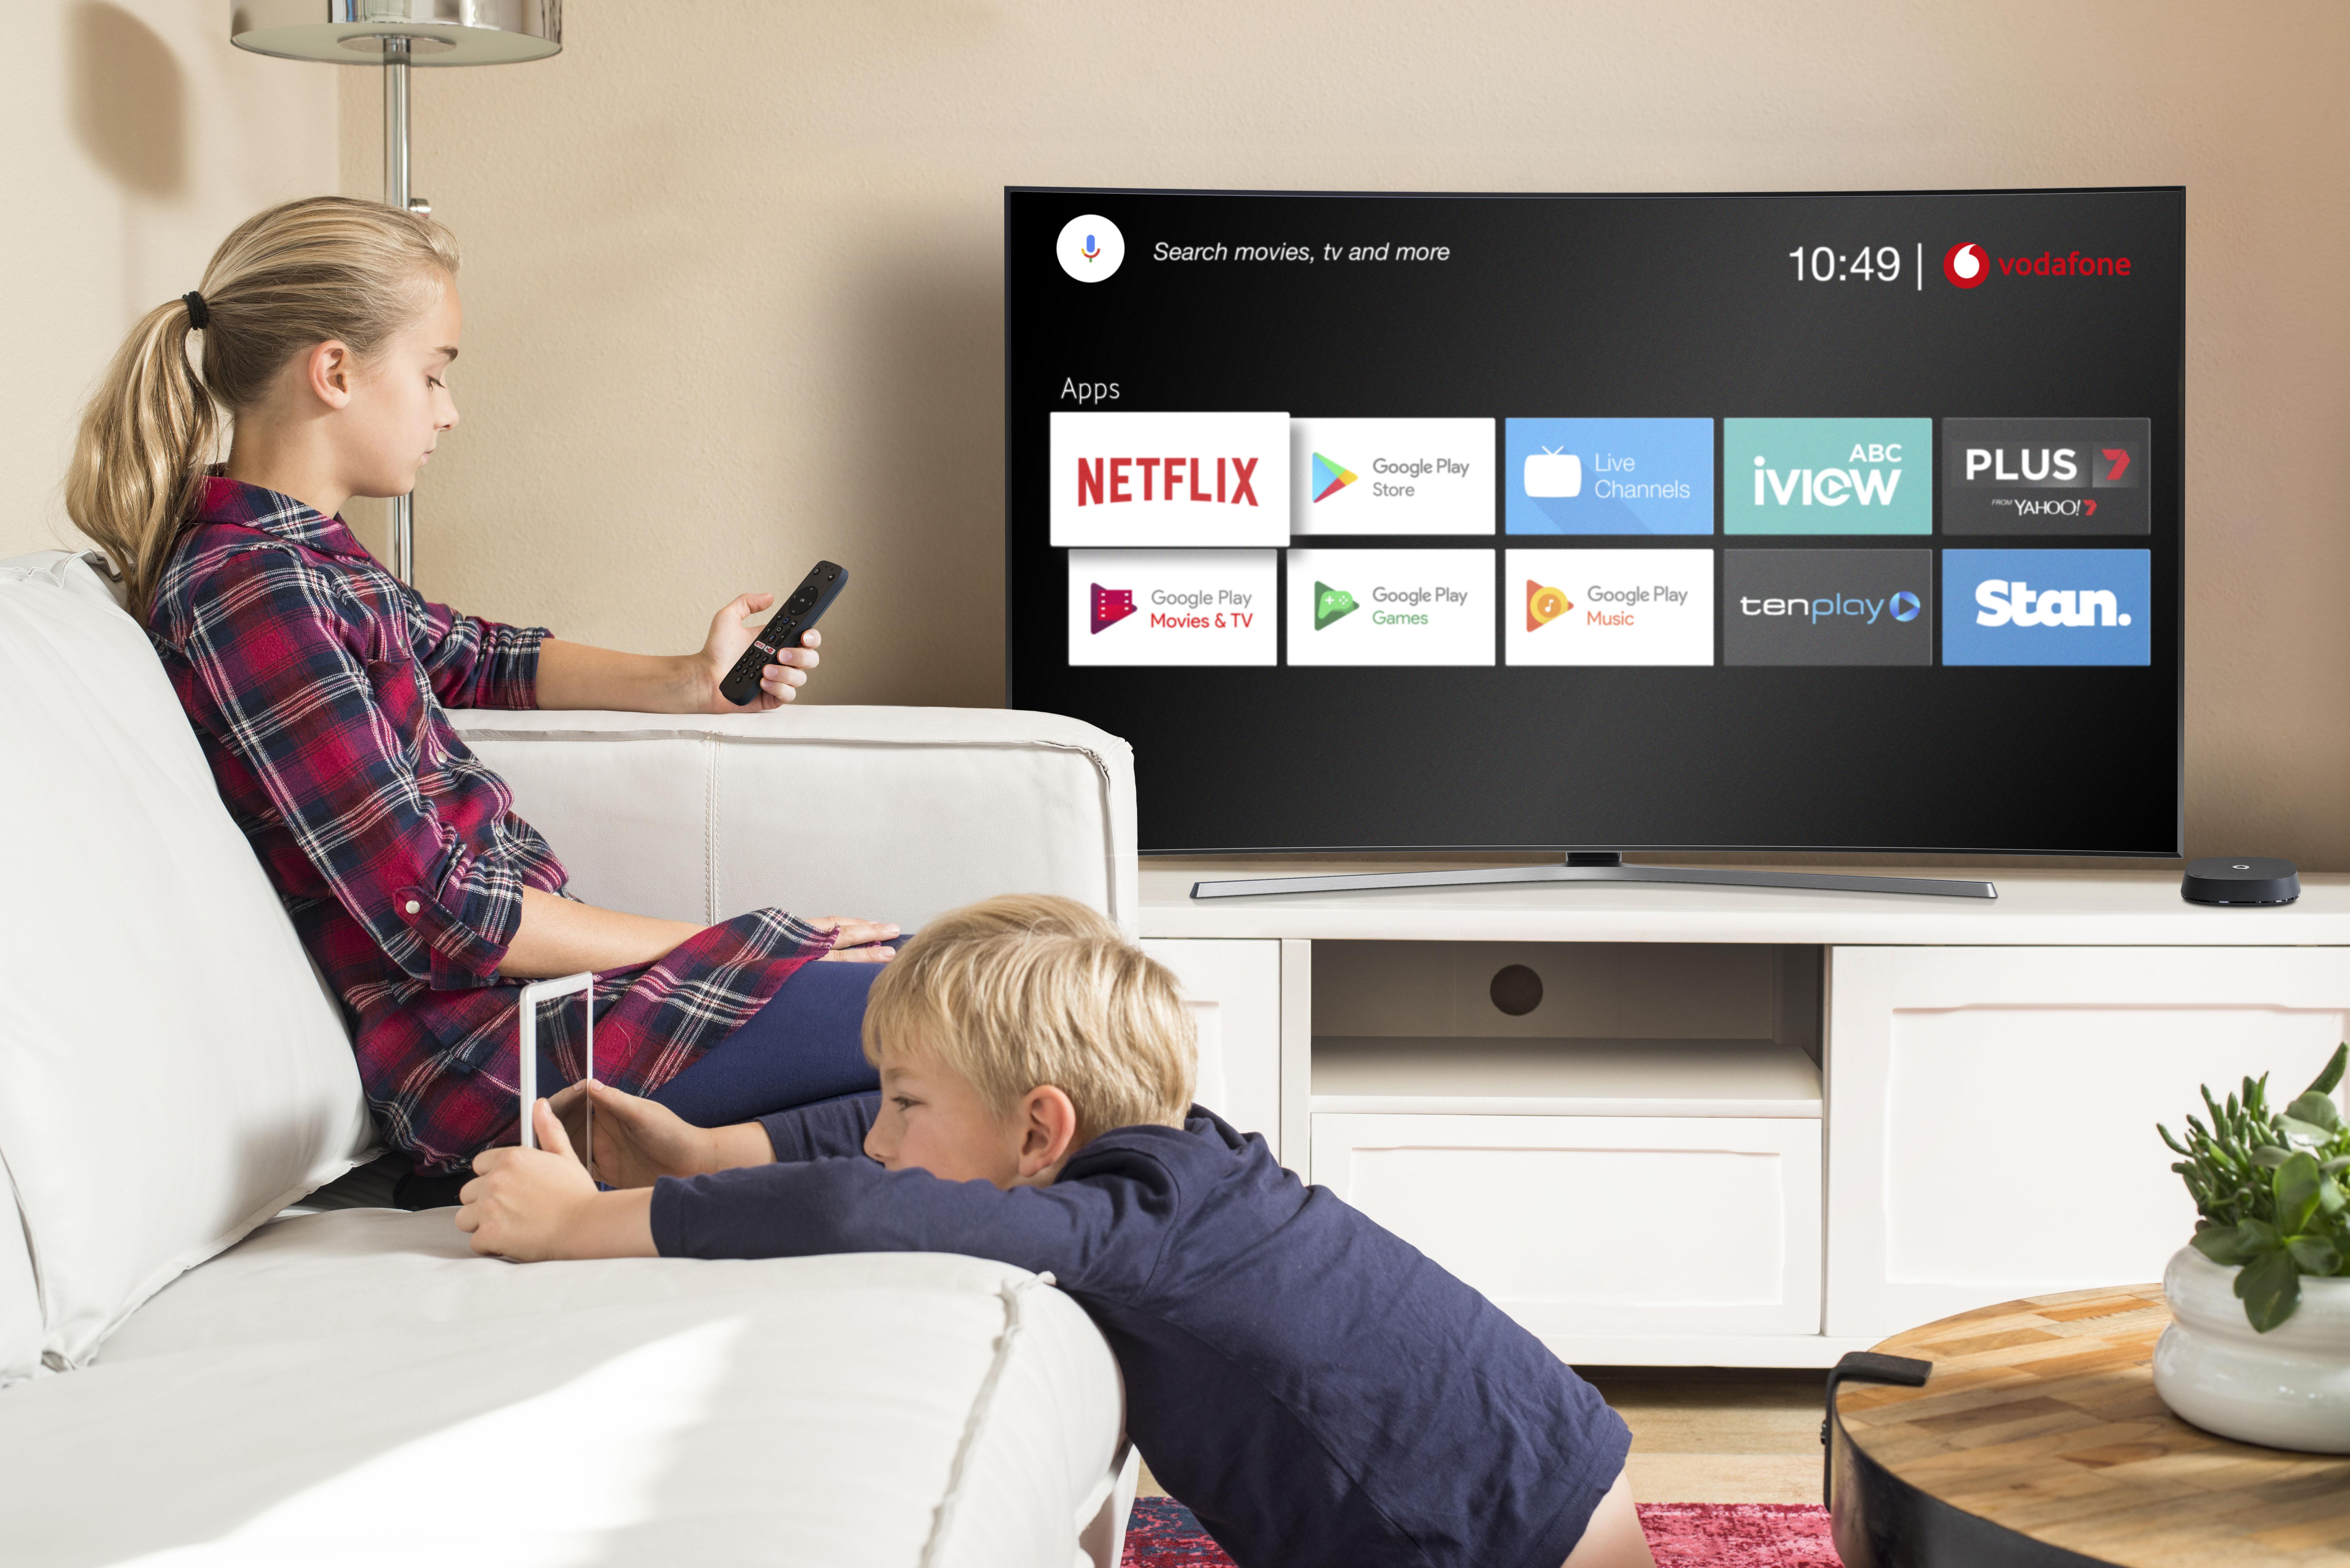 Vodafone Bundles Netflix With Nbn Launches Vodafone Tv